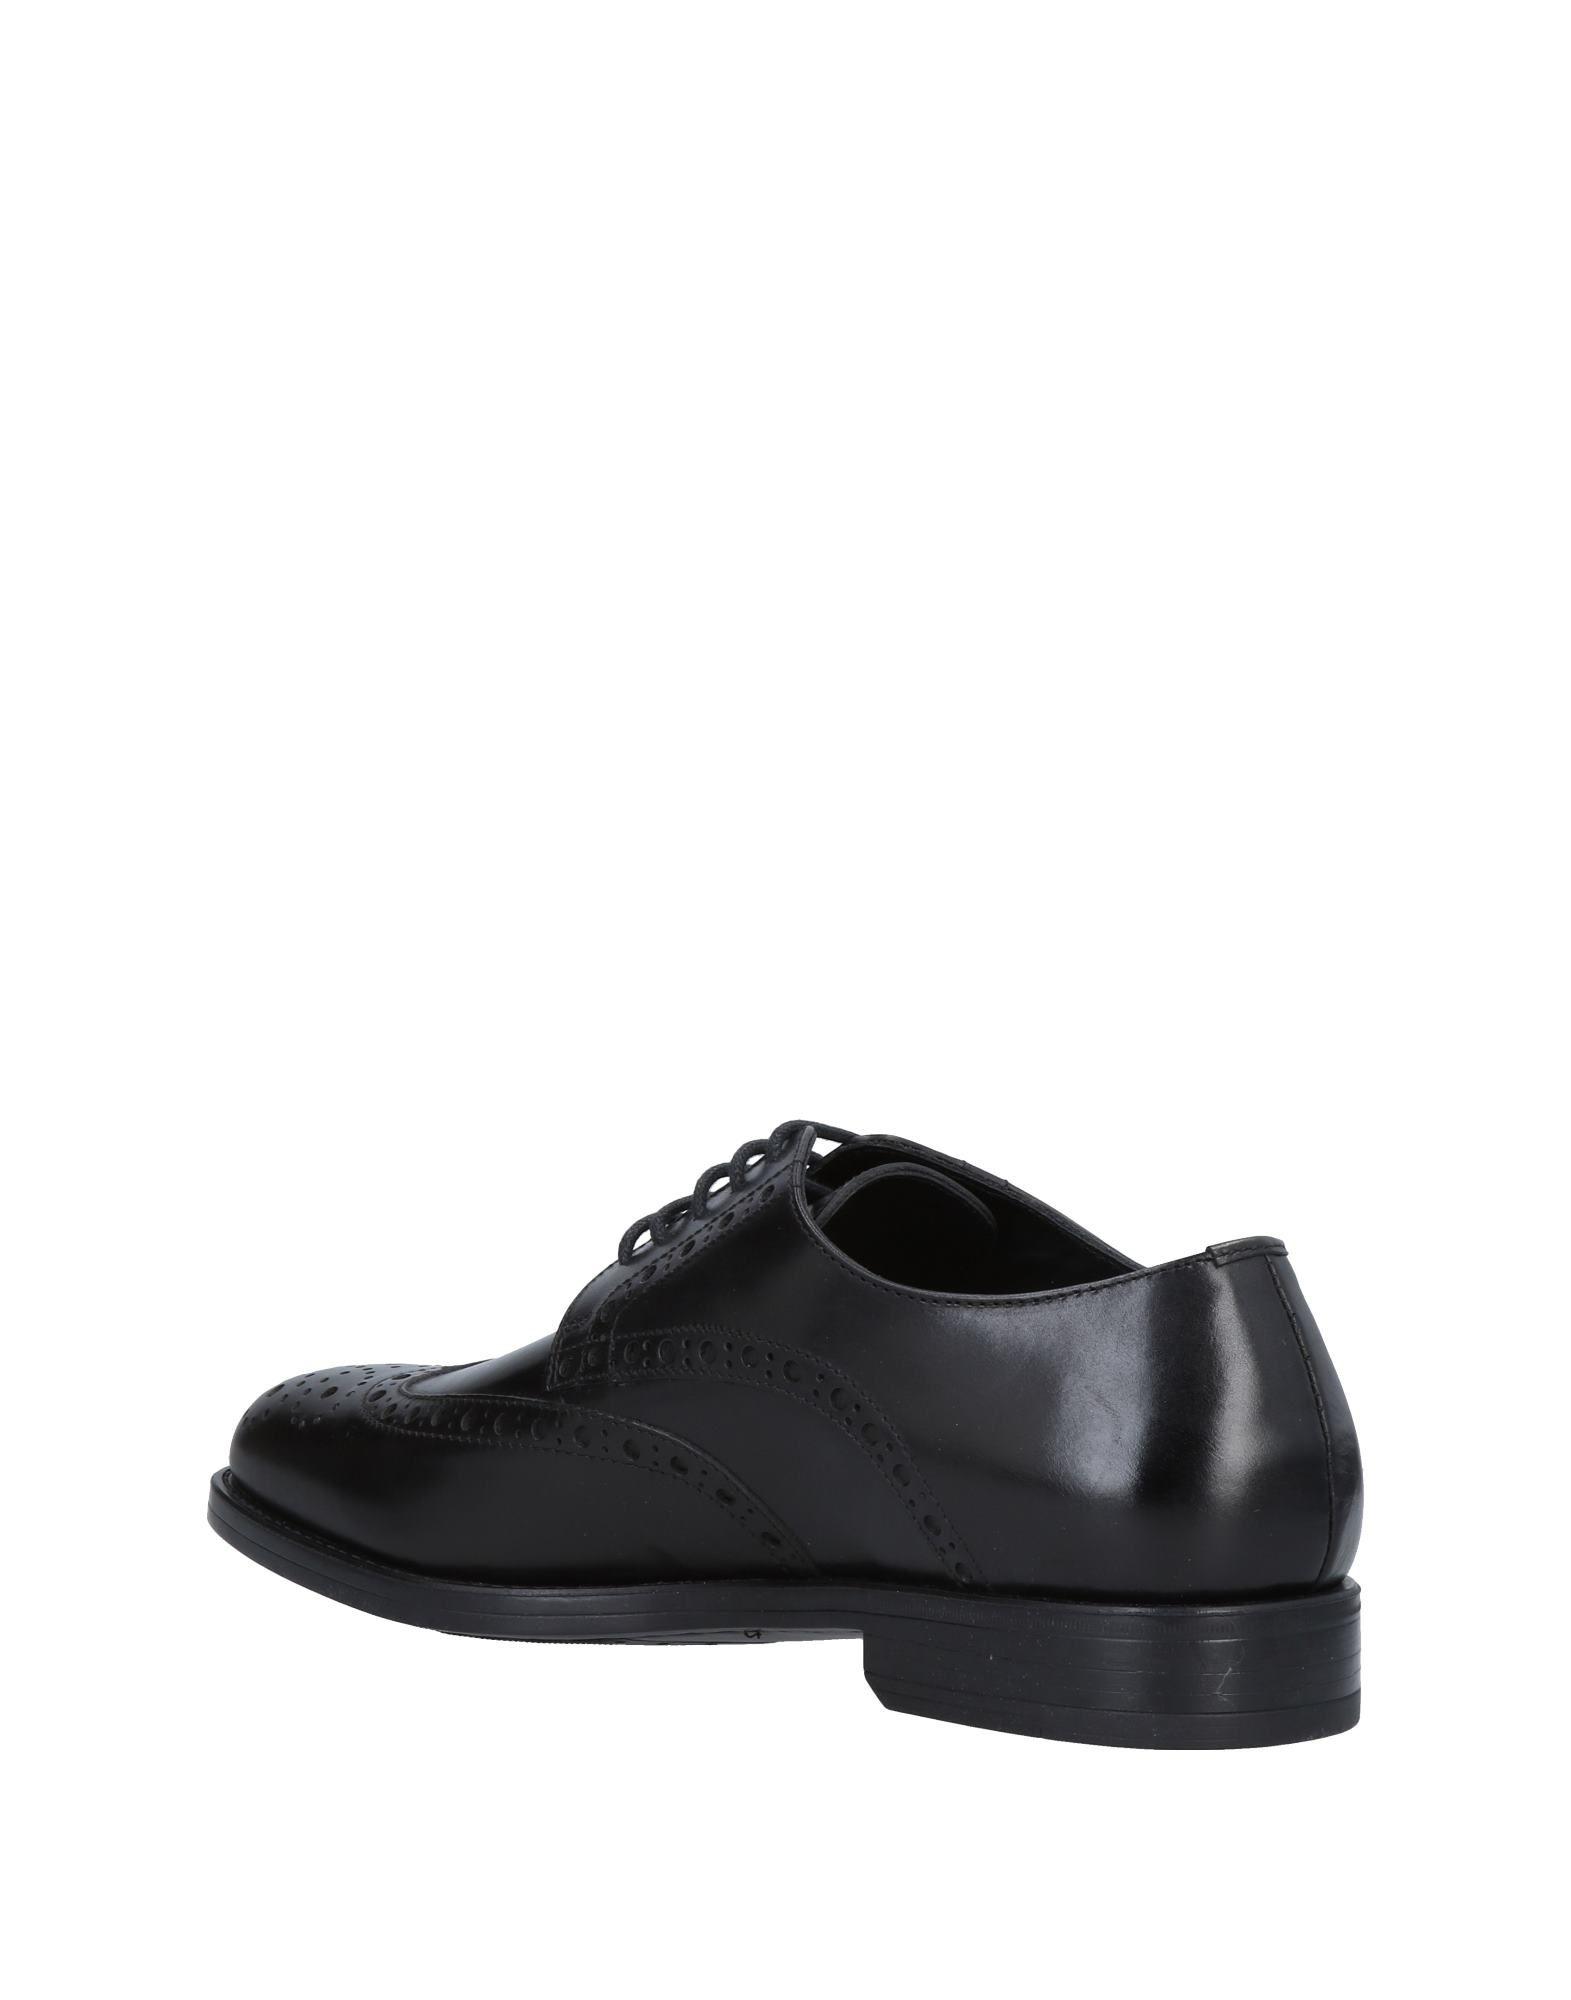 Rabatt echte Schuhe Triver Flight Schnürschuhe Herren  11481537GV